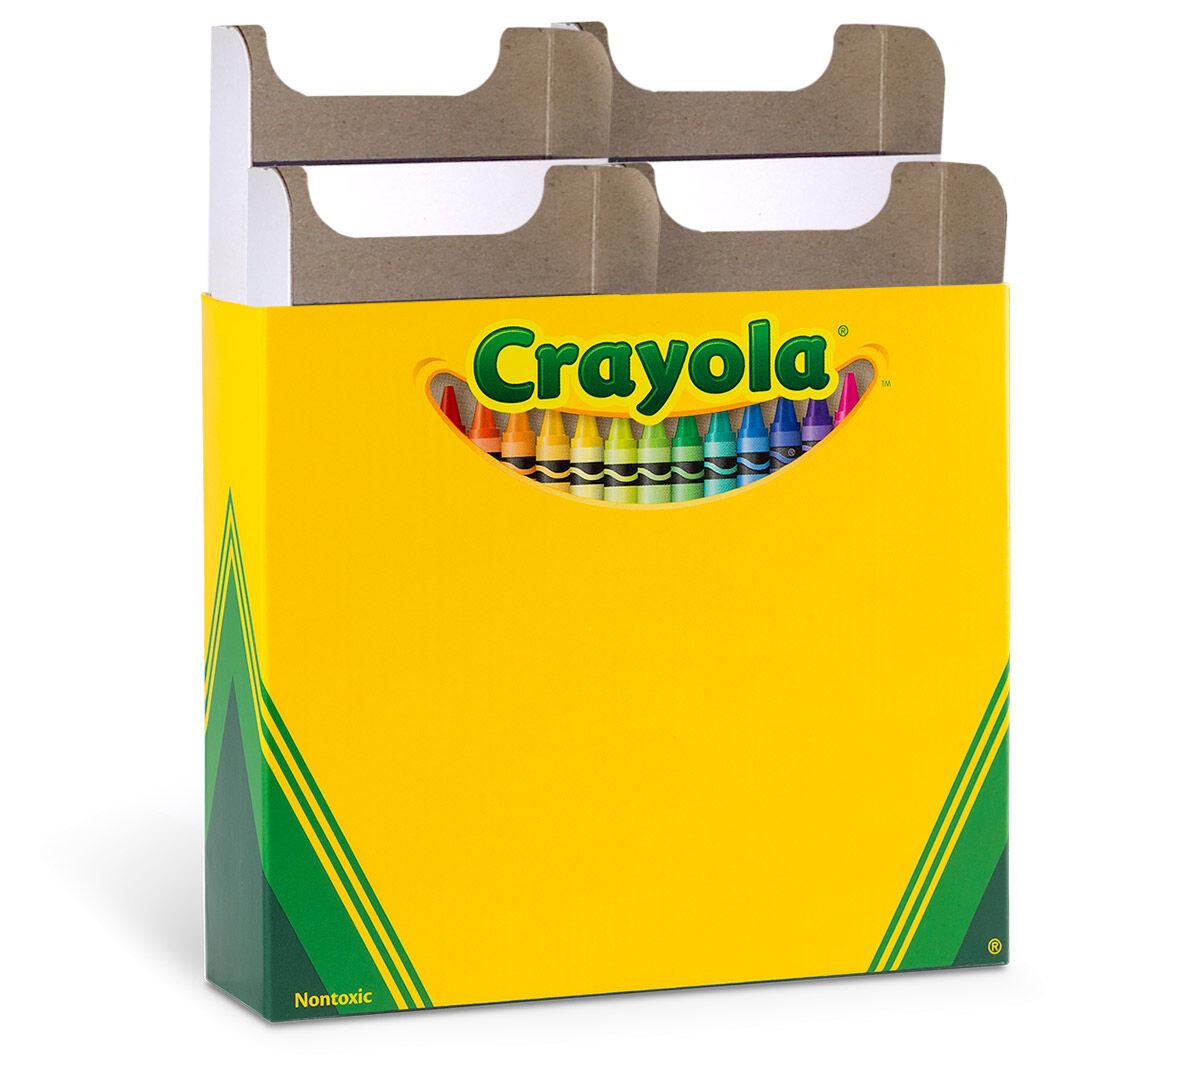 Crayola Custom 64 Personalized Crayon Box